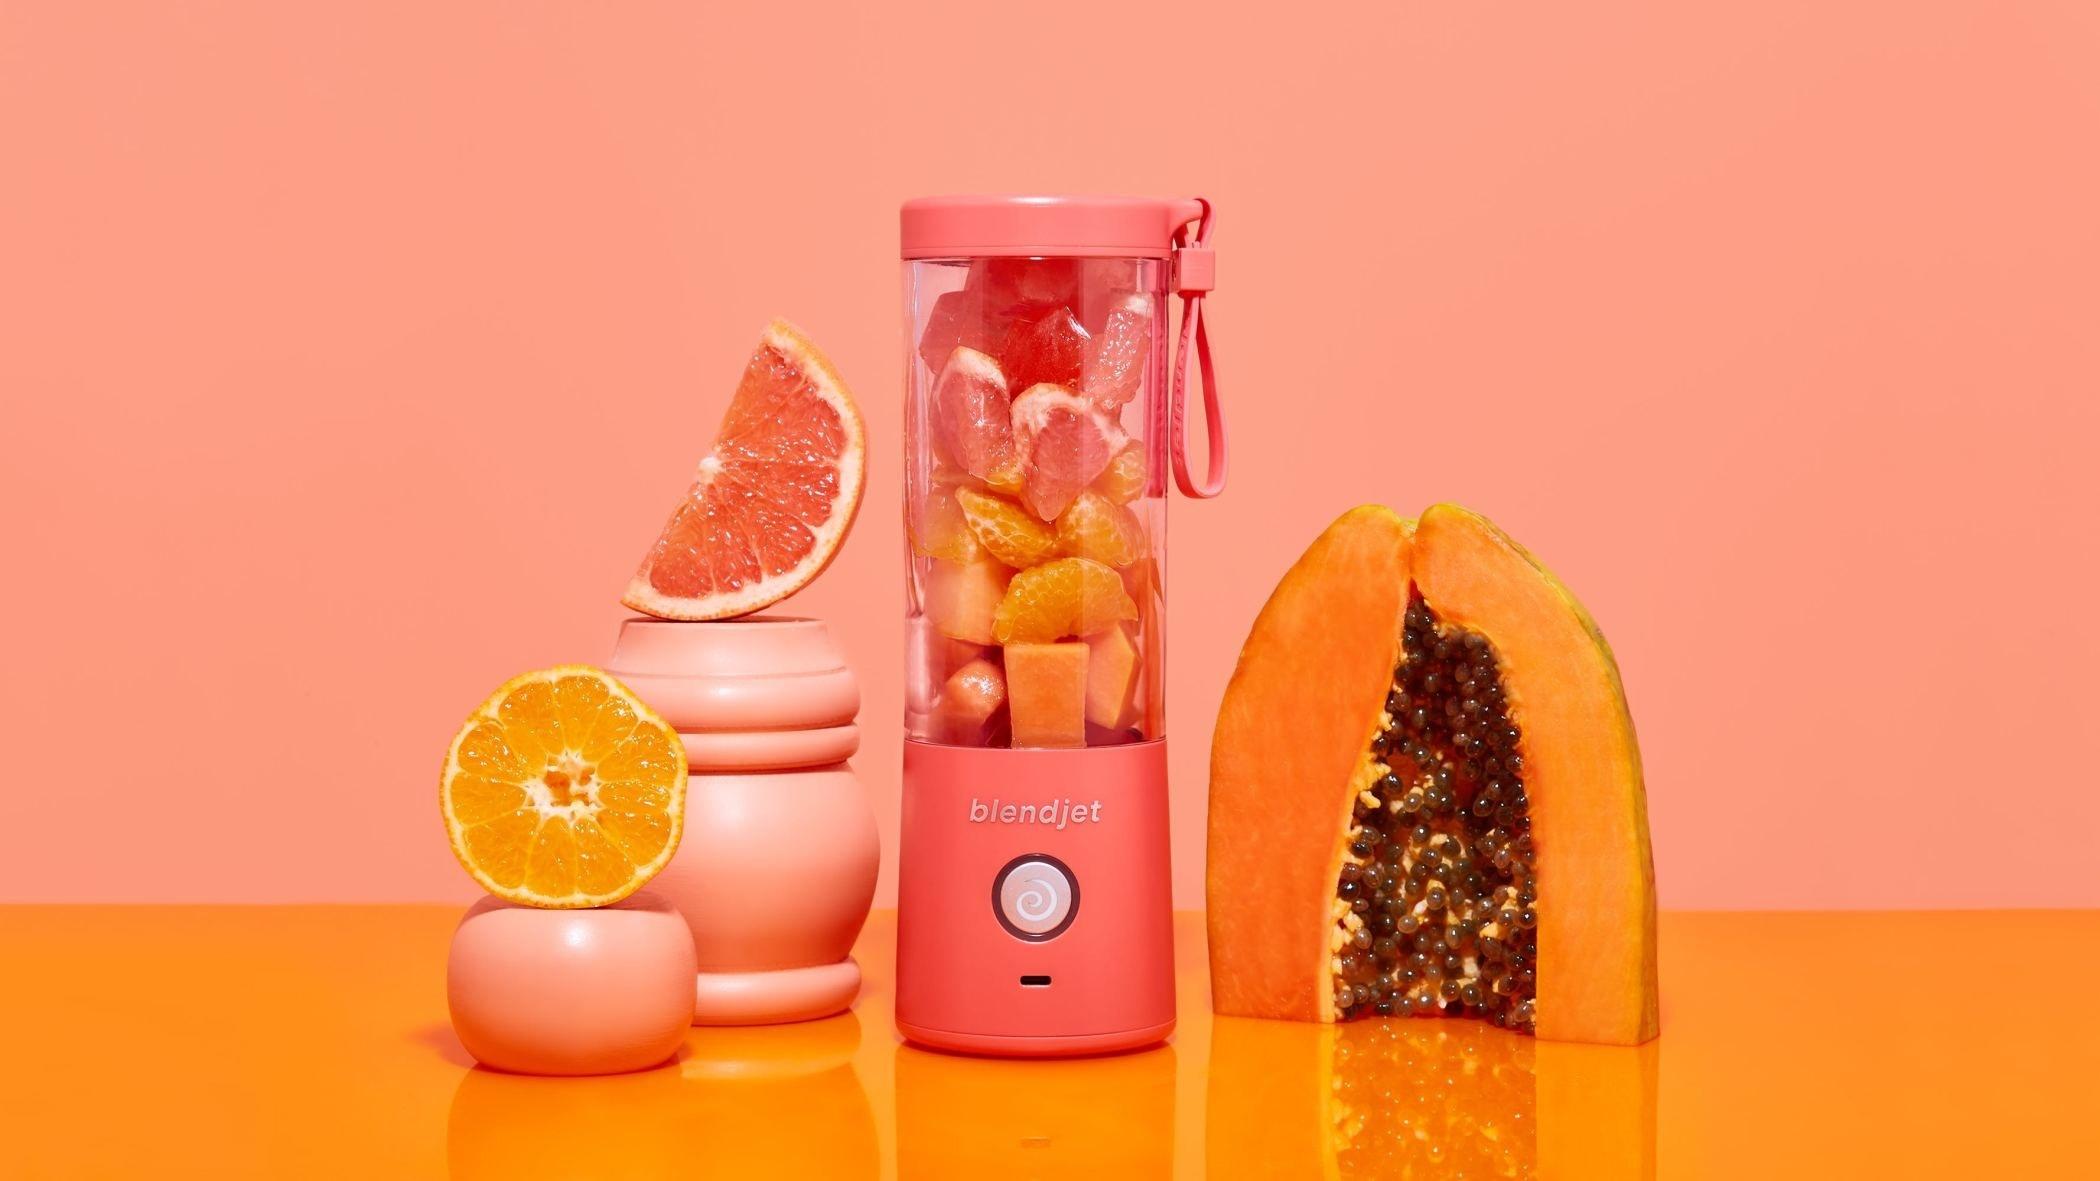 pink blend jet next to fruit